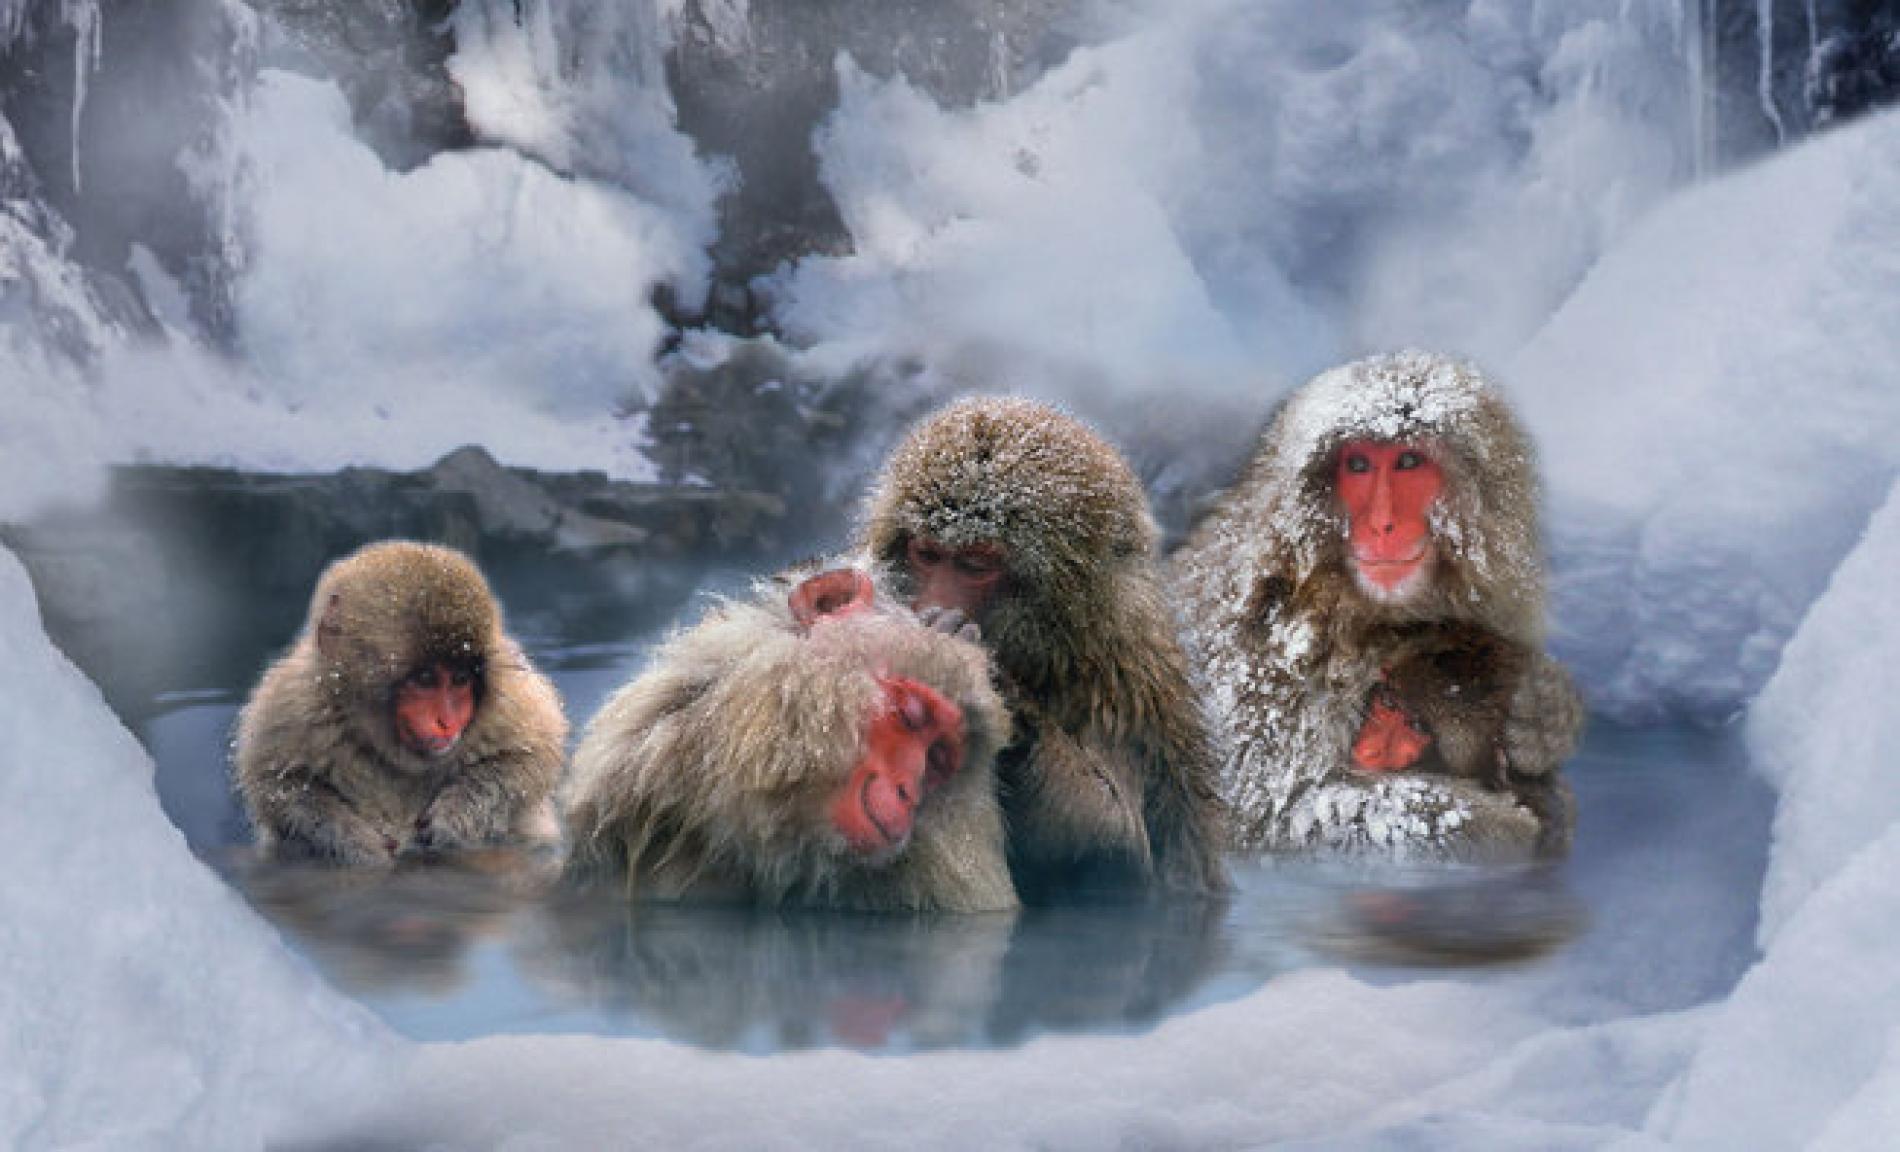 japan winter tours winter festivals snow monkeys. Black Bedroom Furniture Sets. Home Design Ideas